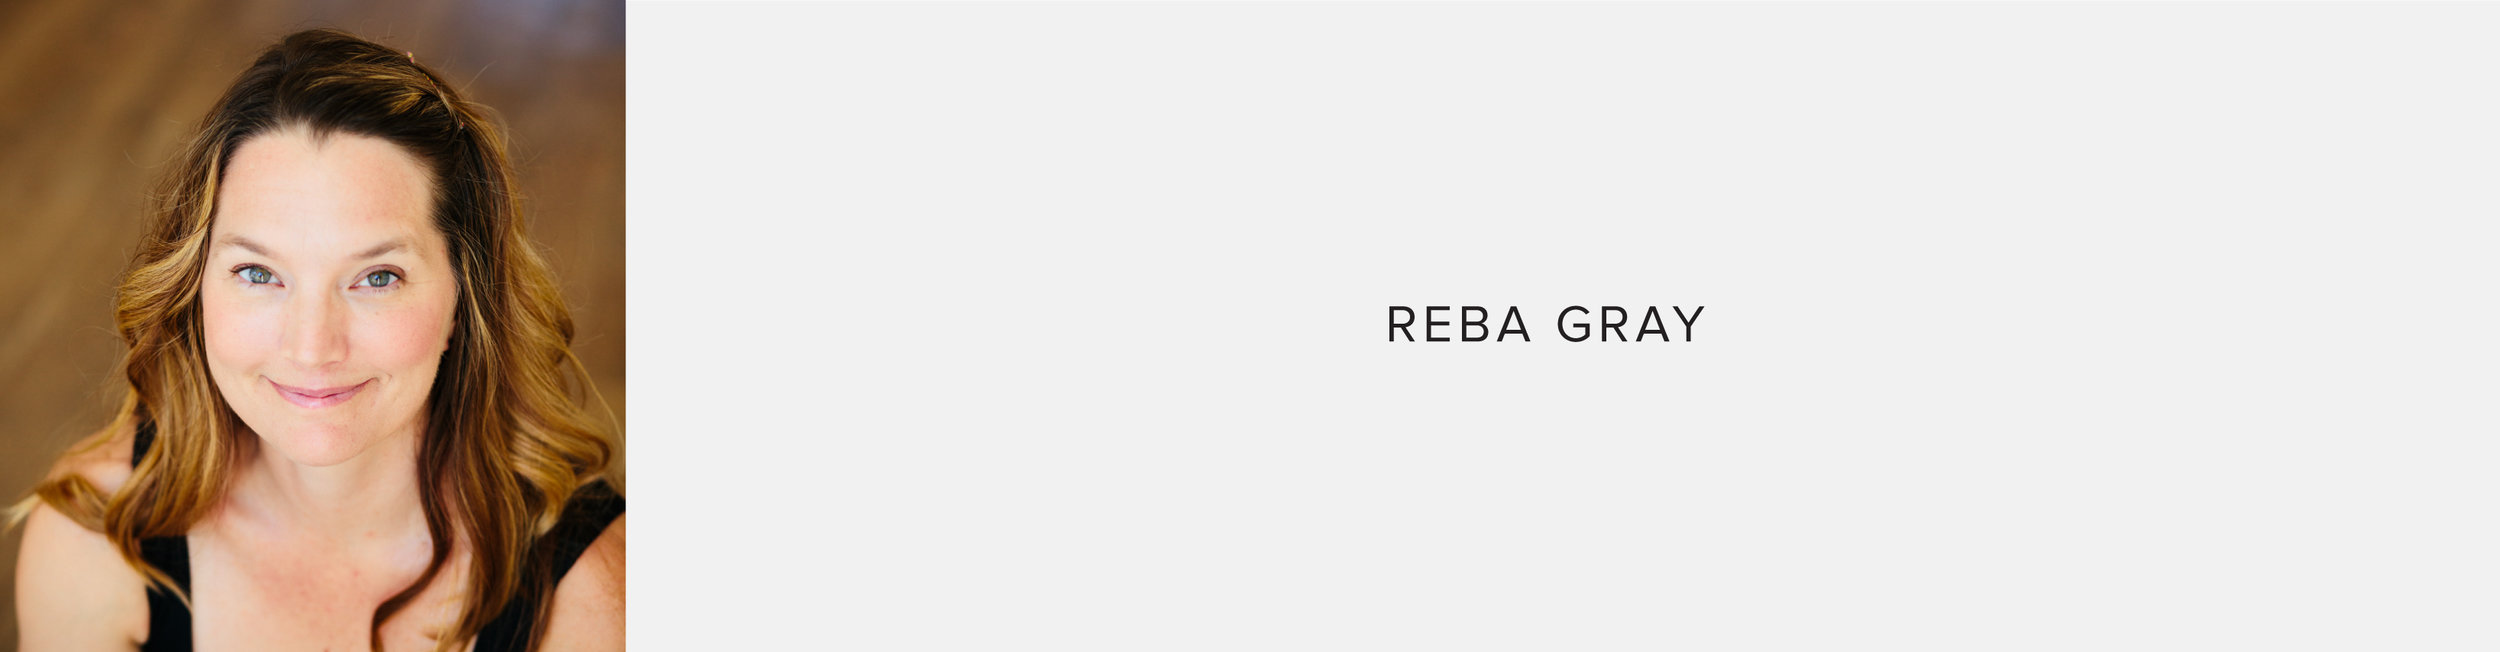 Reba-Gray.jpg